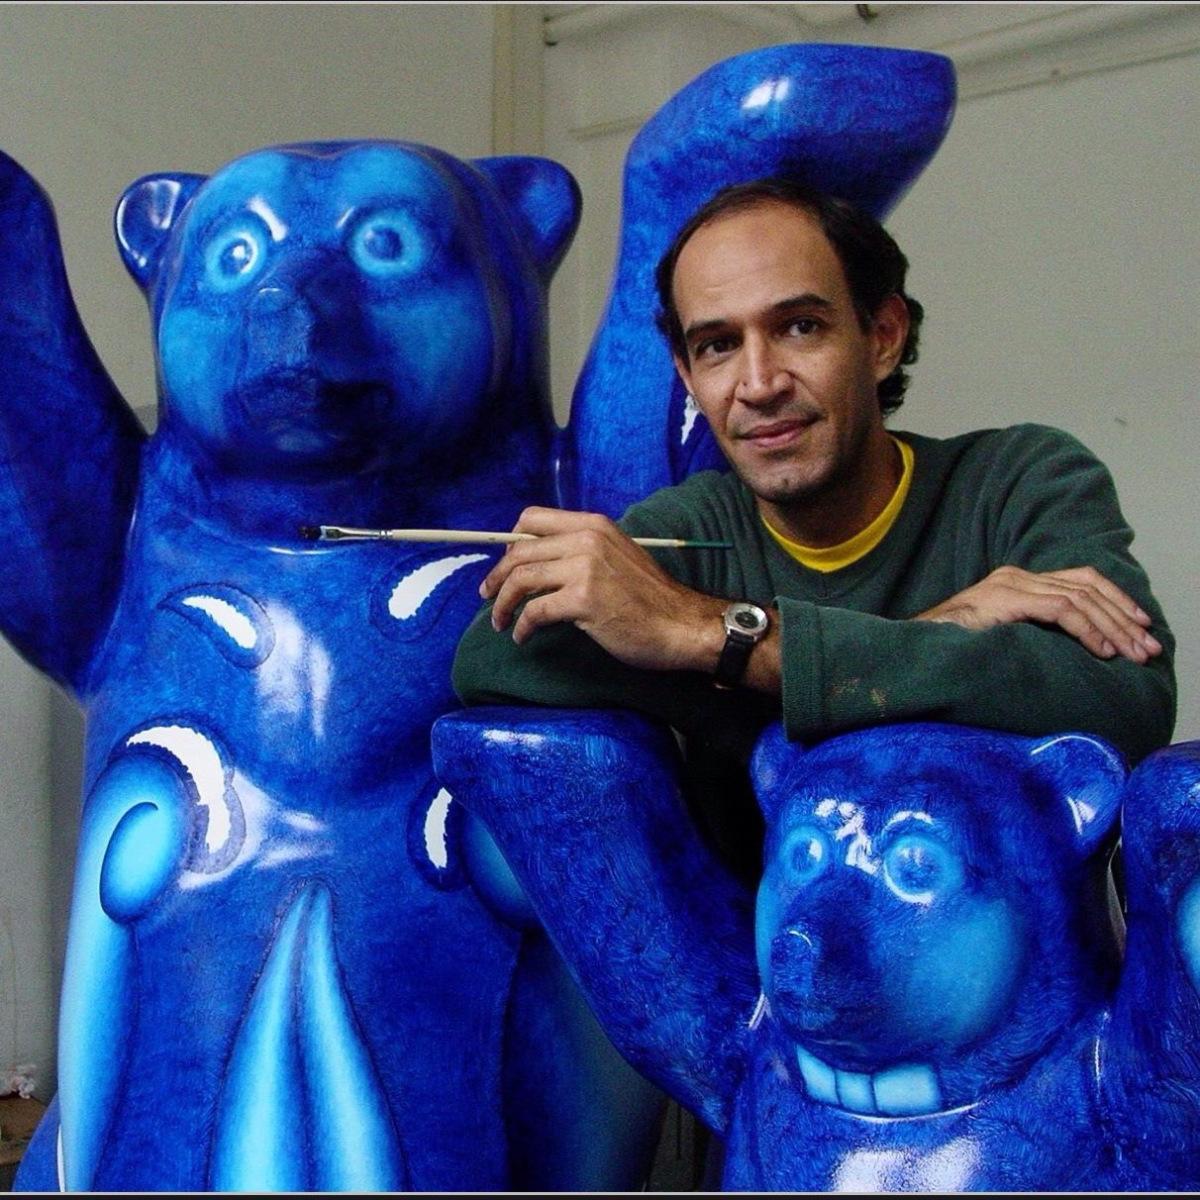 Ministerio de Cultura anuncia exposición del artista plástico Amado Melo